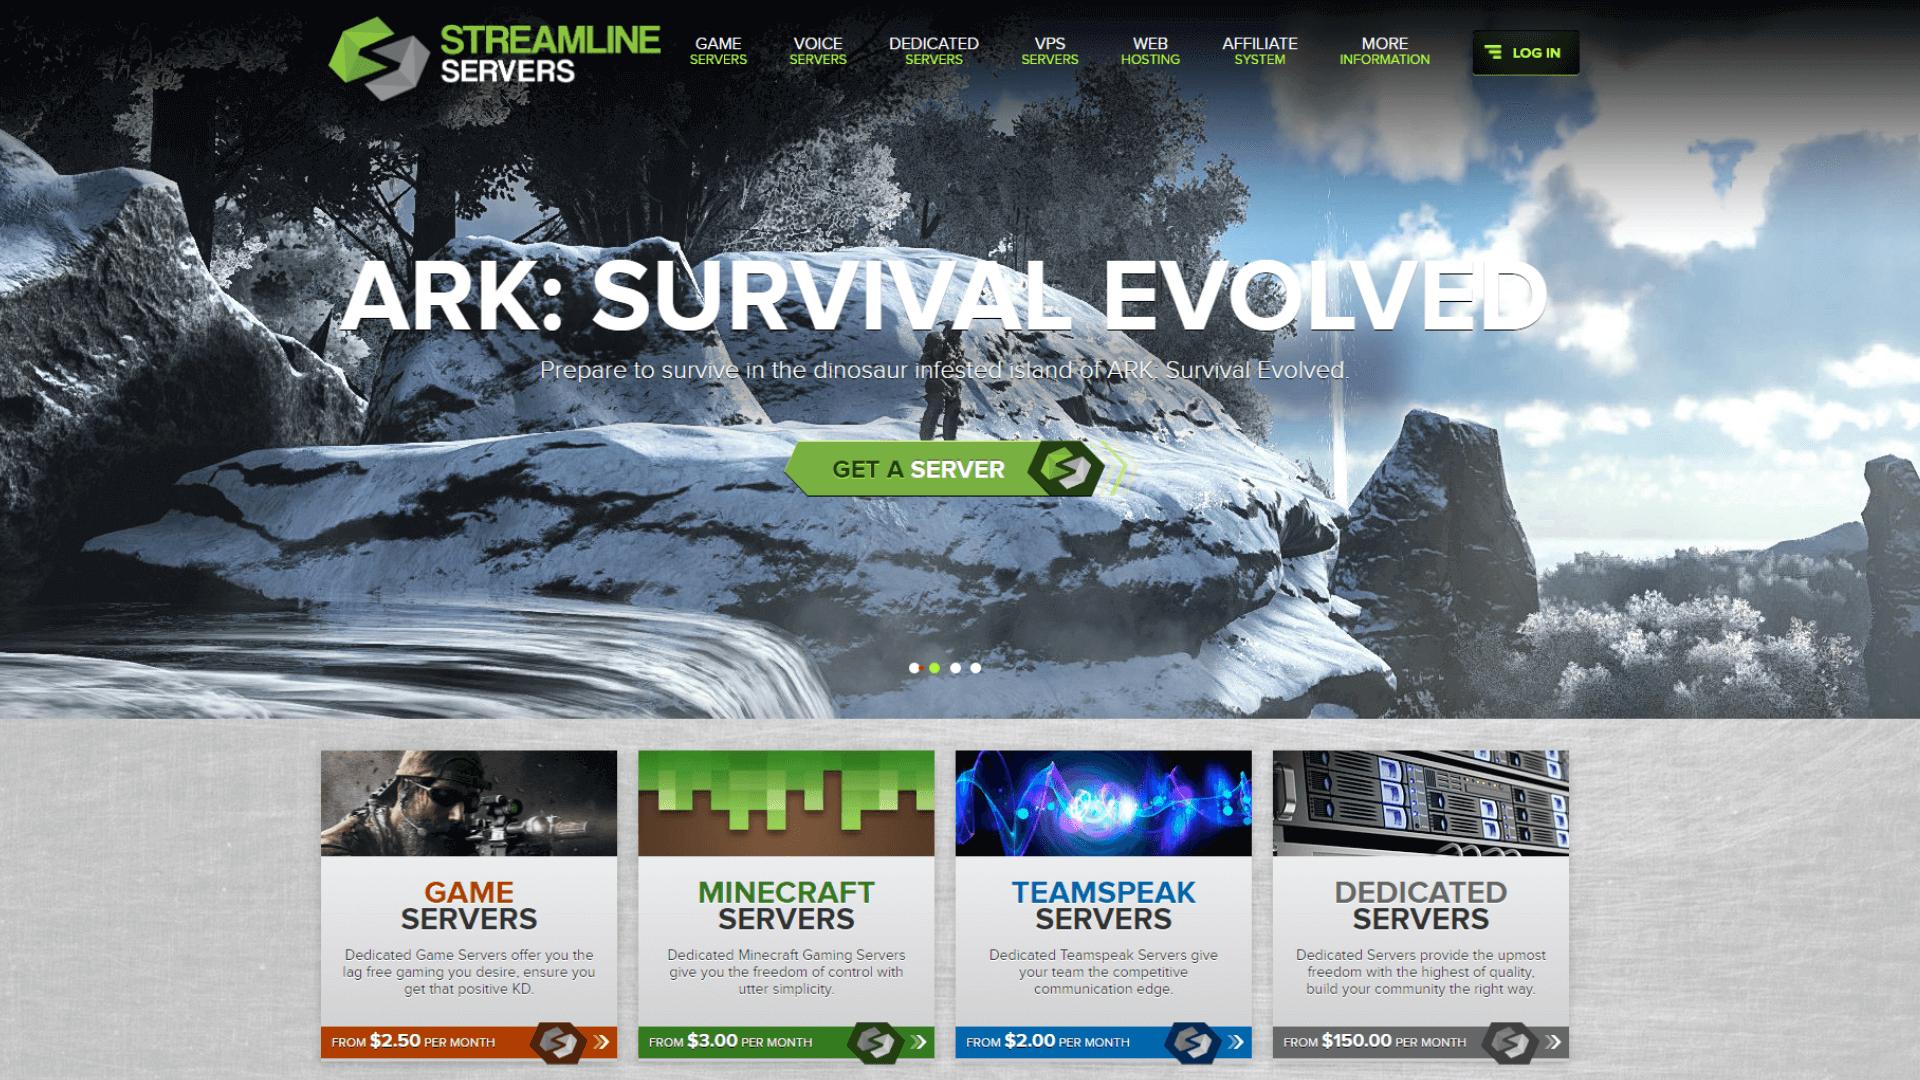 streamline servers website screenshot